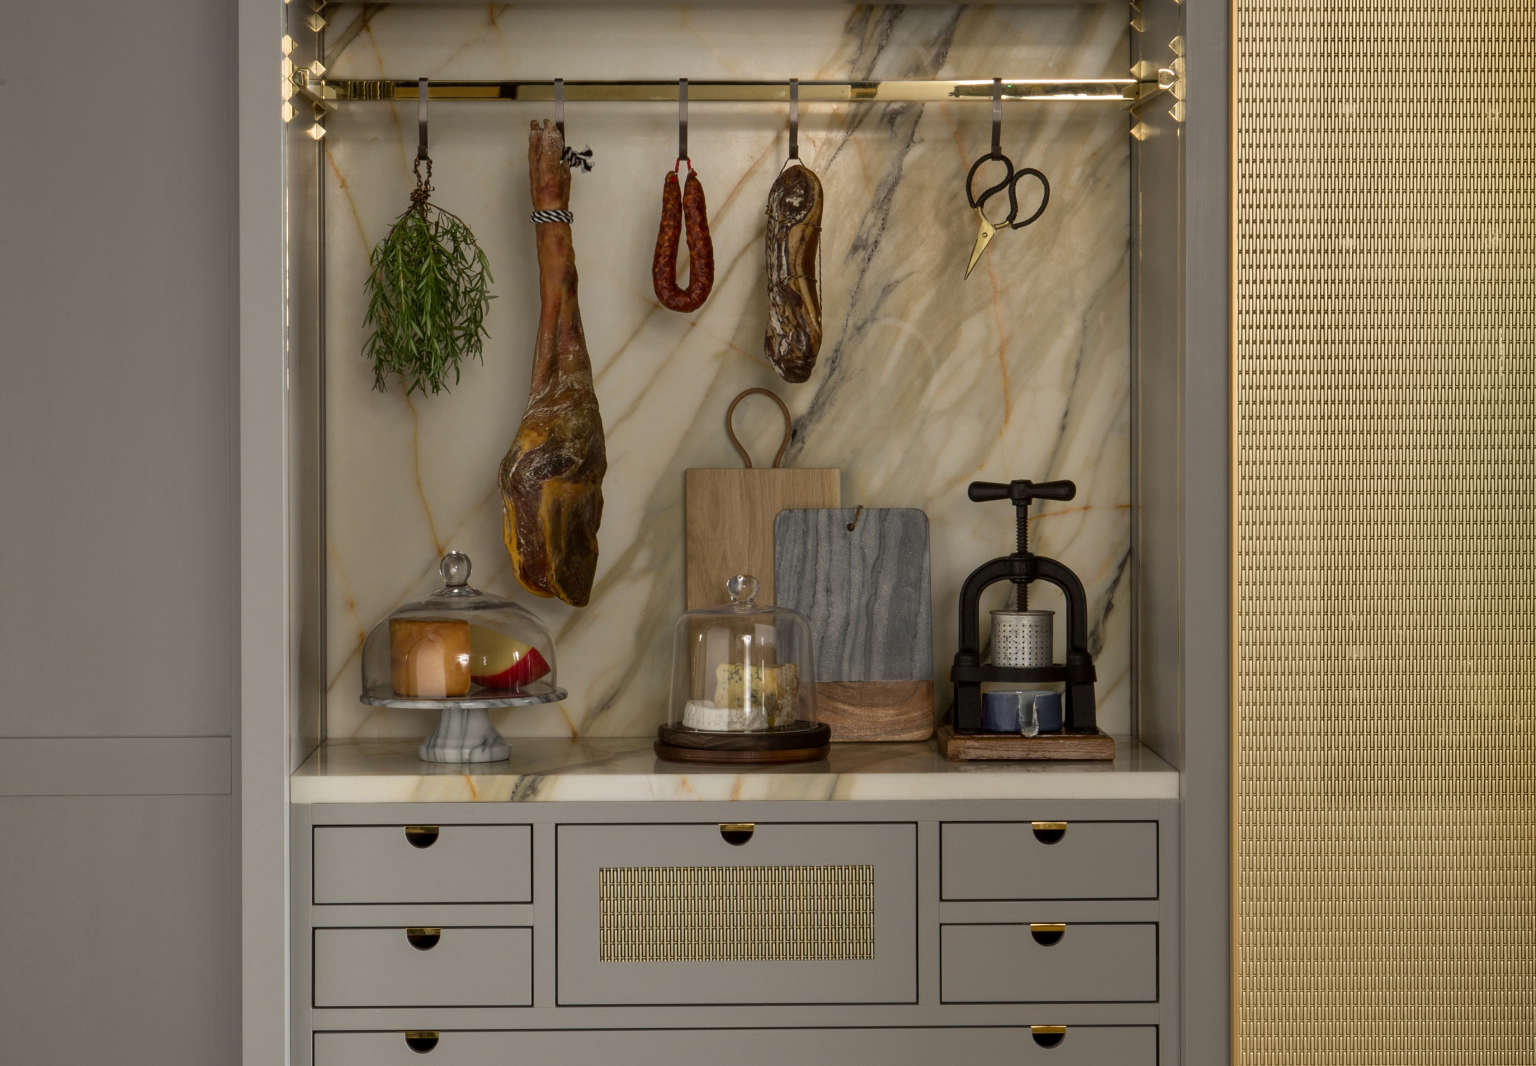 lanserring tradescant kitchen 4c